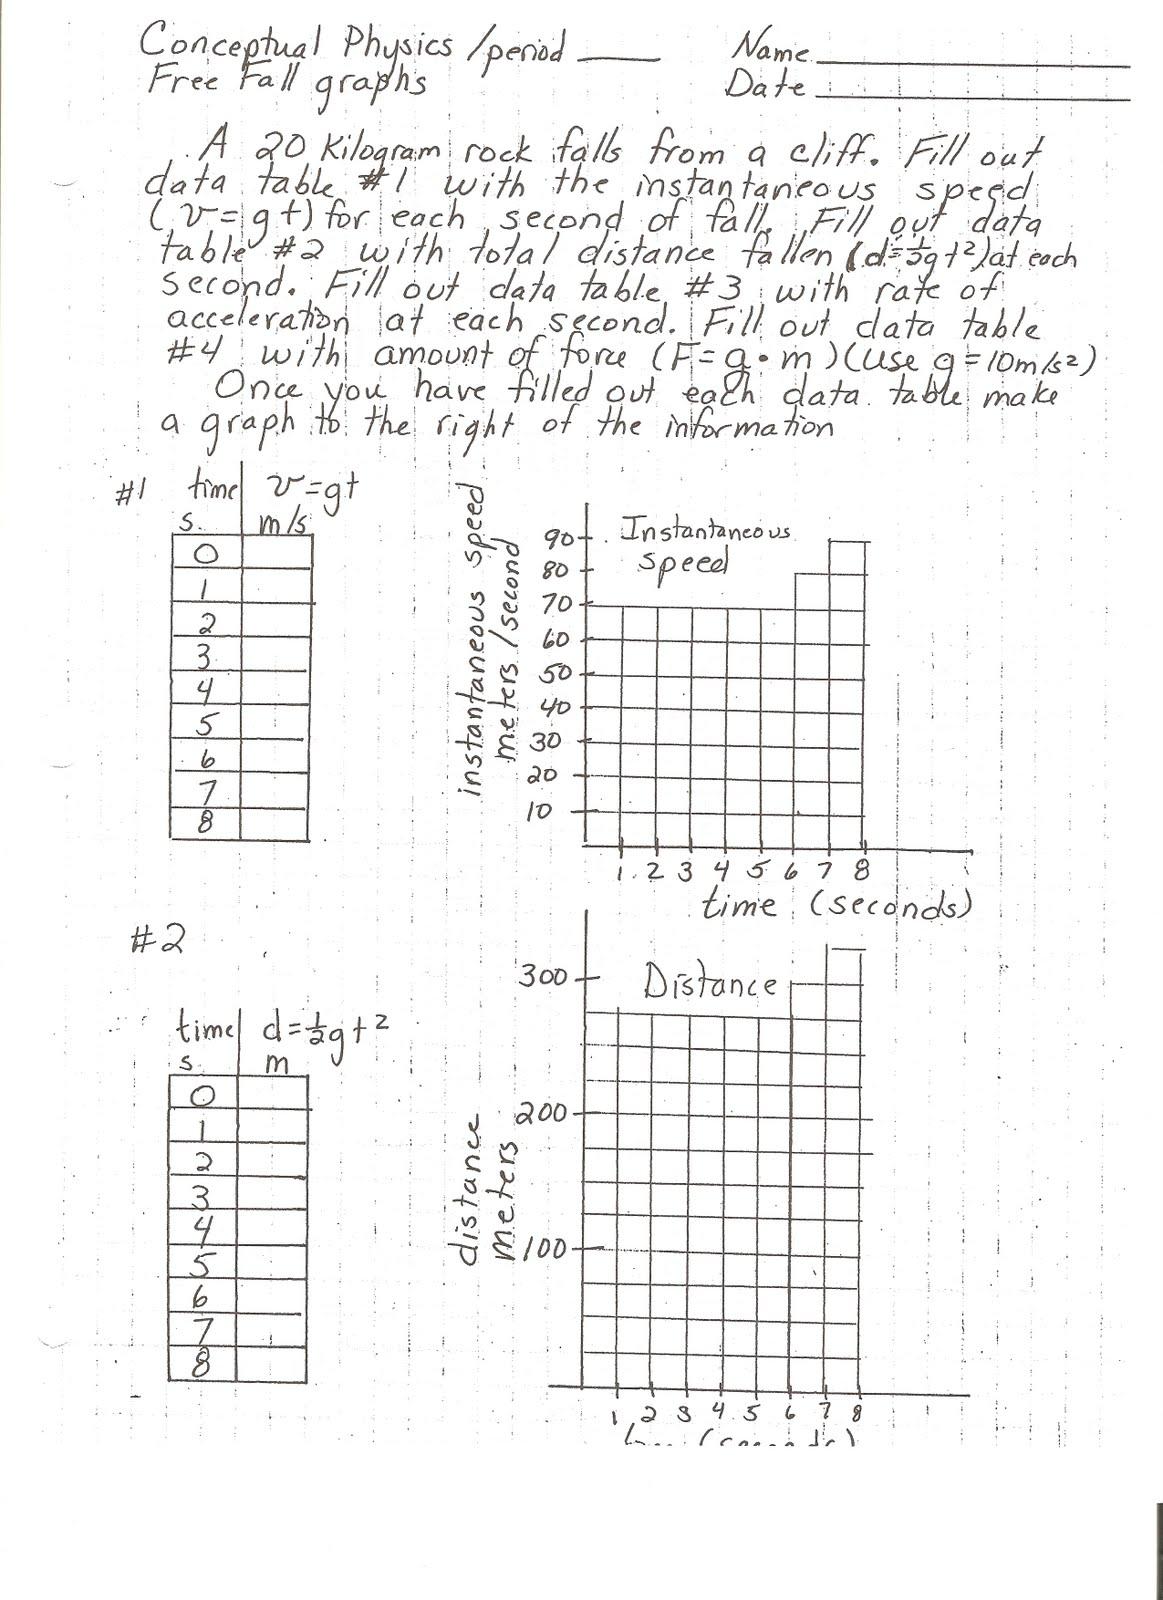 Physics Due Mon Sept 20 Free Fall Graphs